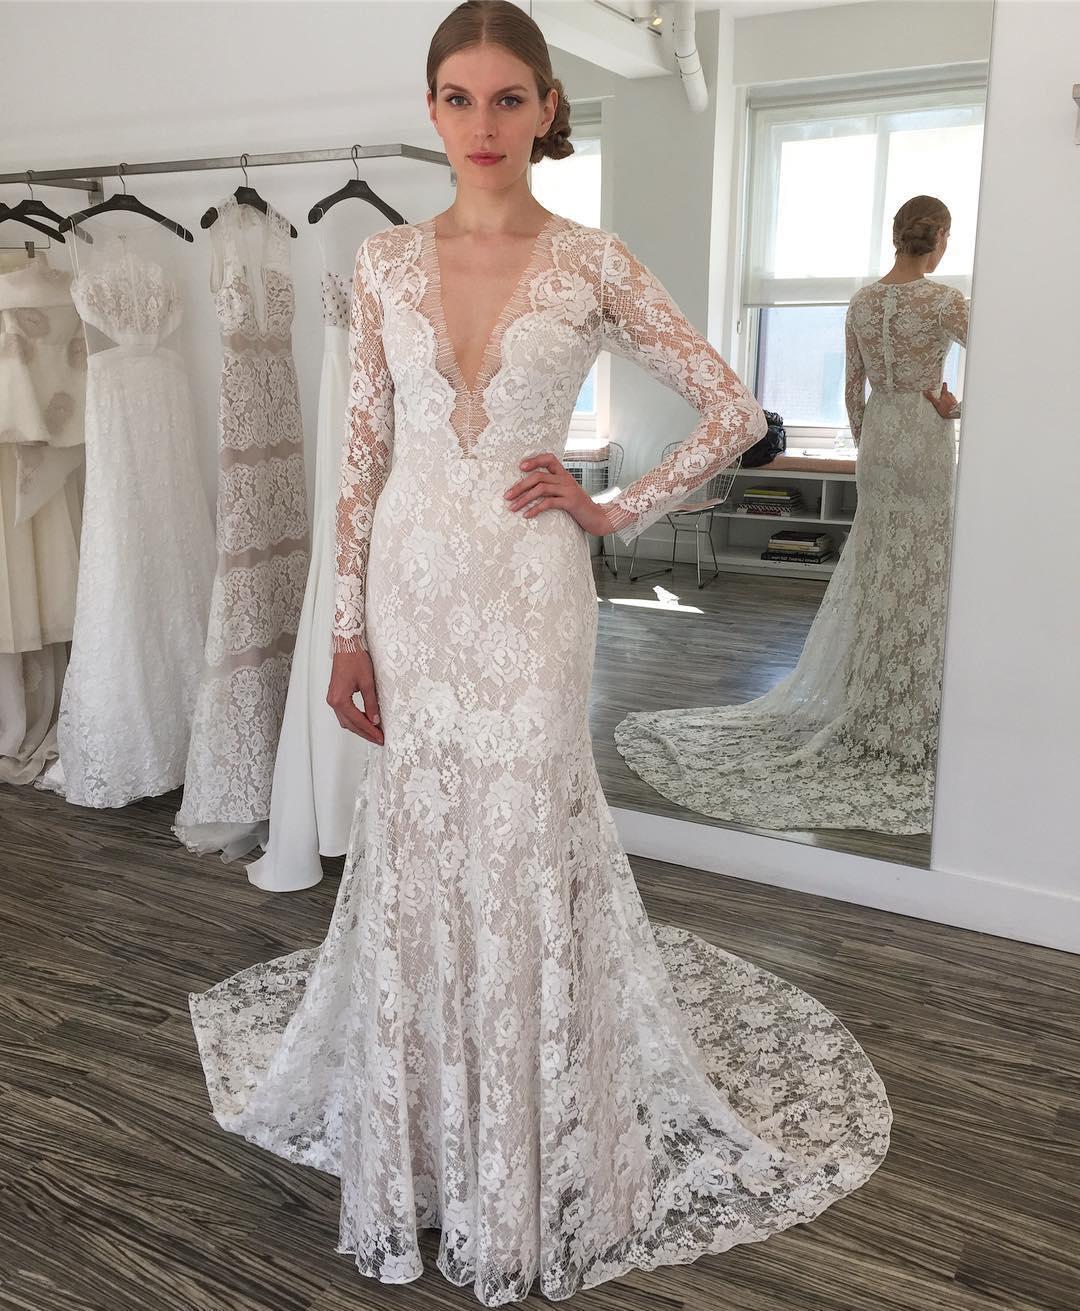 Classy Wedding Gowns